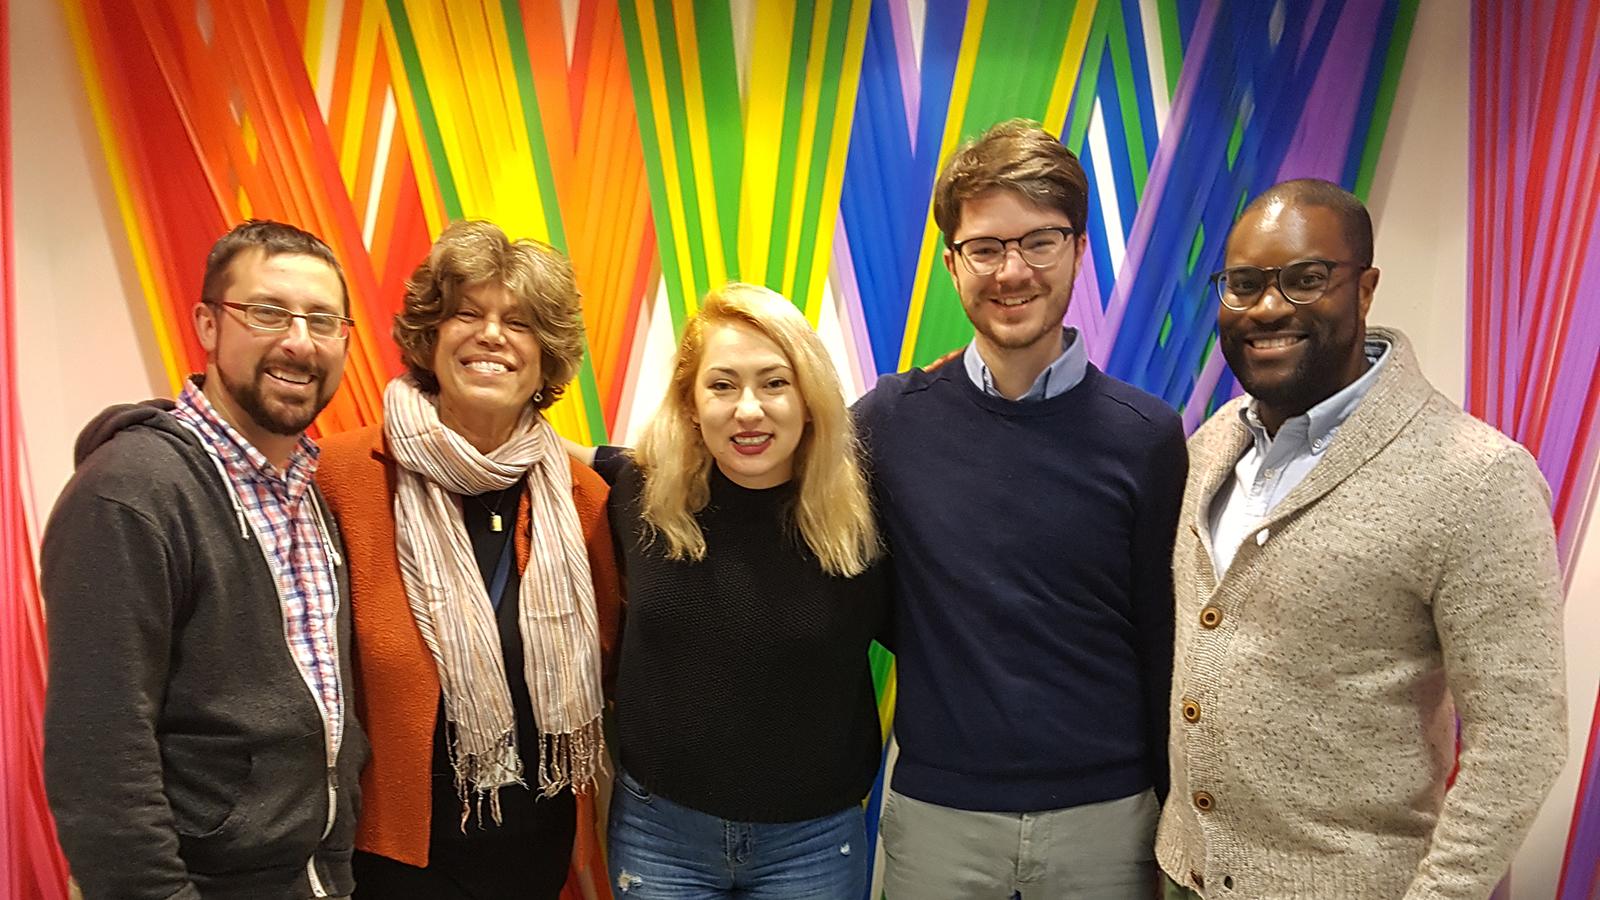 Inspiring Moments as a 2019 HRC Global Fellow